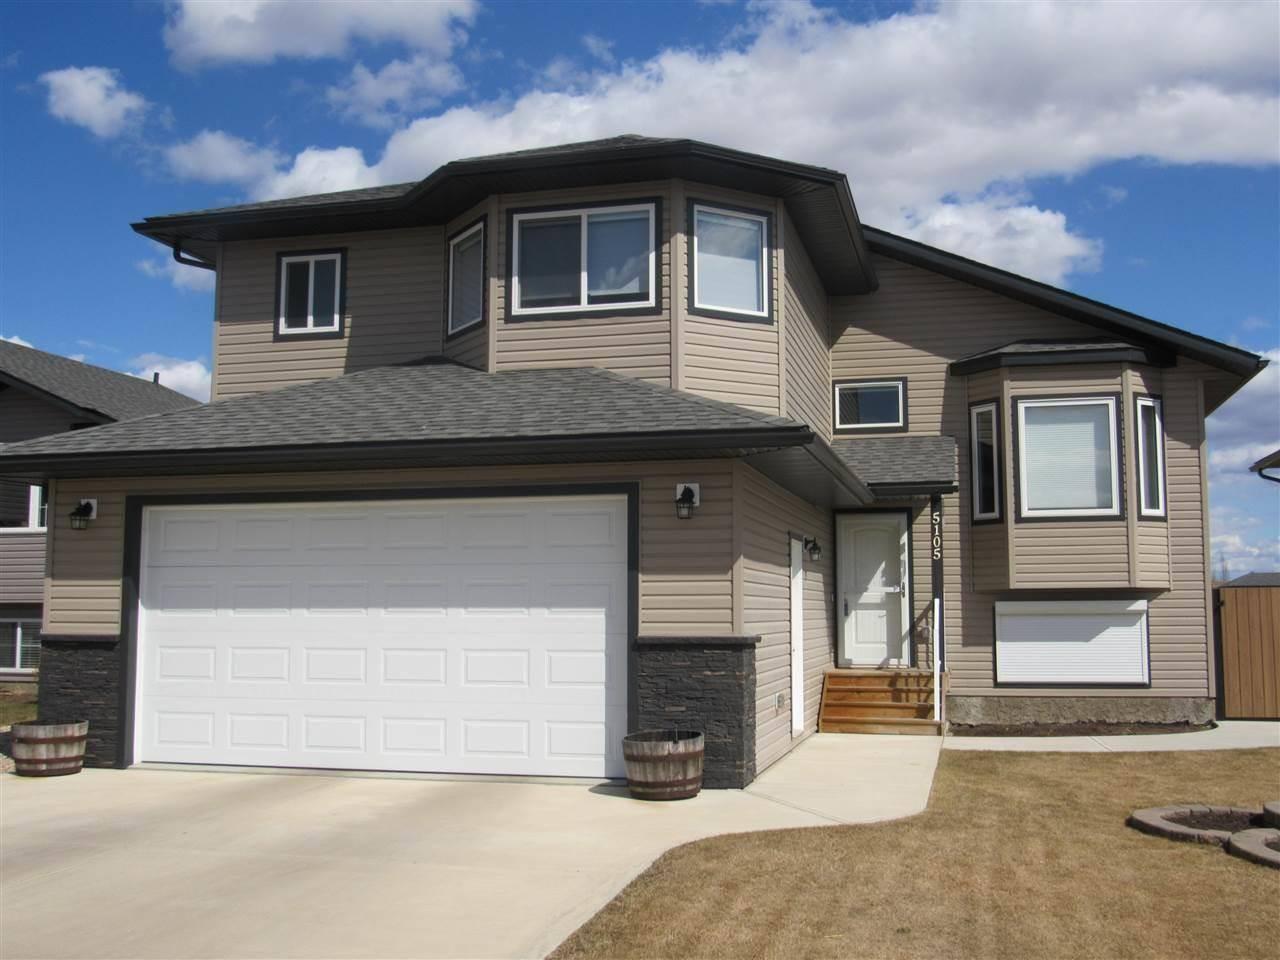 House for sale at 5105 61 St Barrhead Alberta - MLS: E4183693